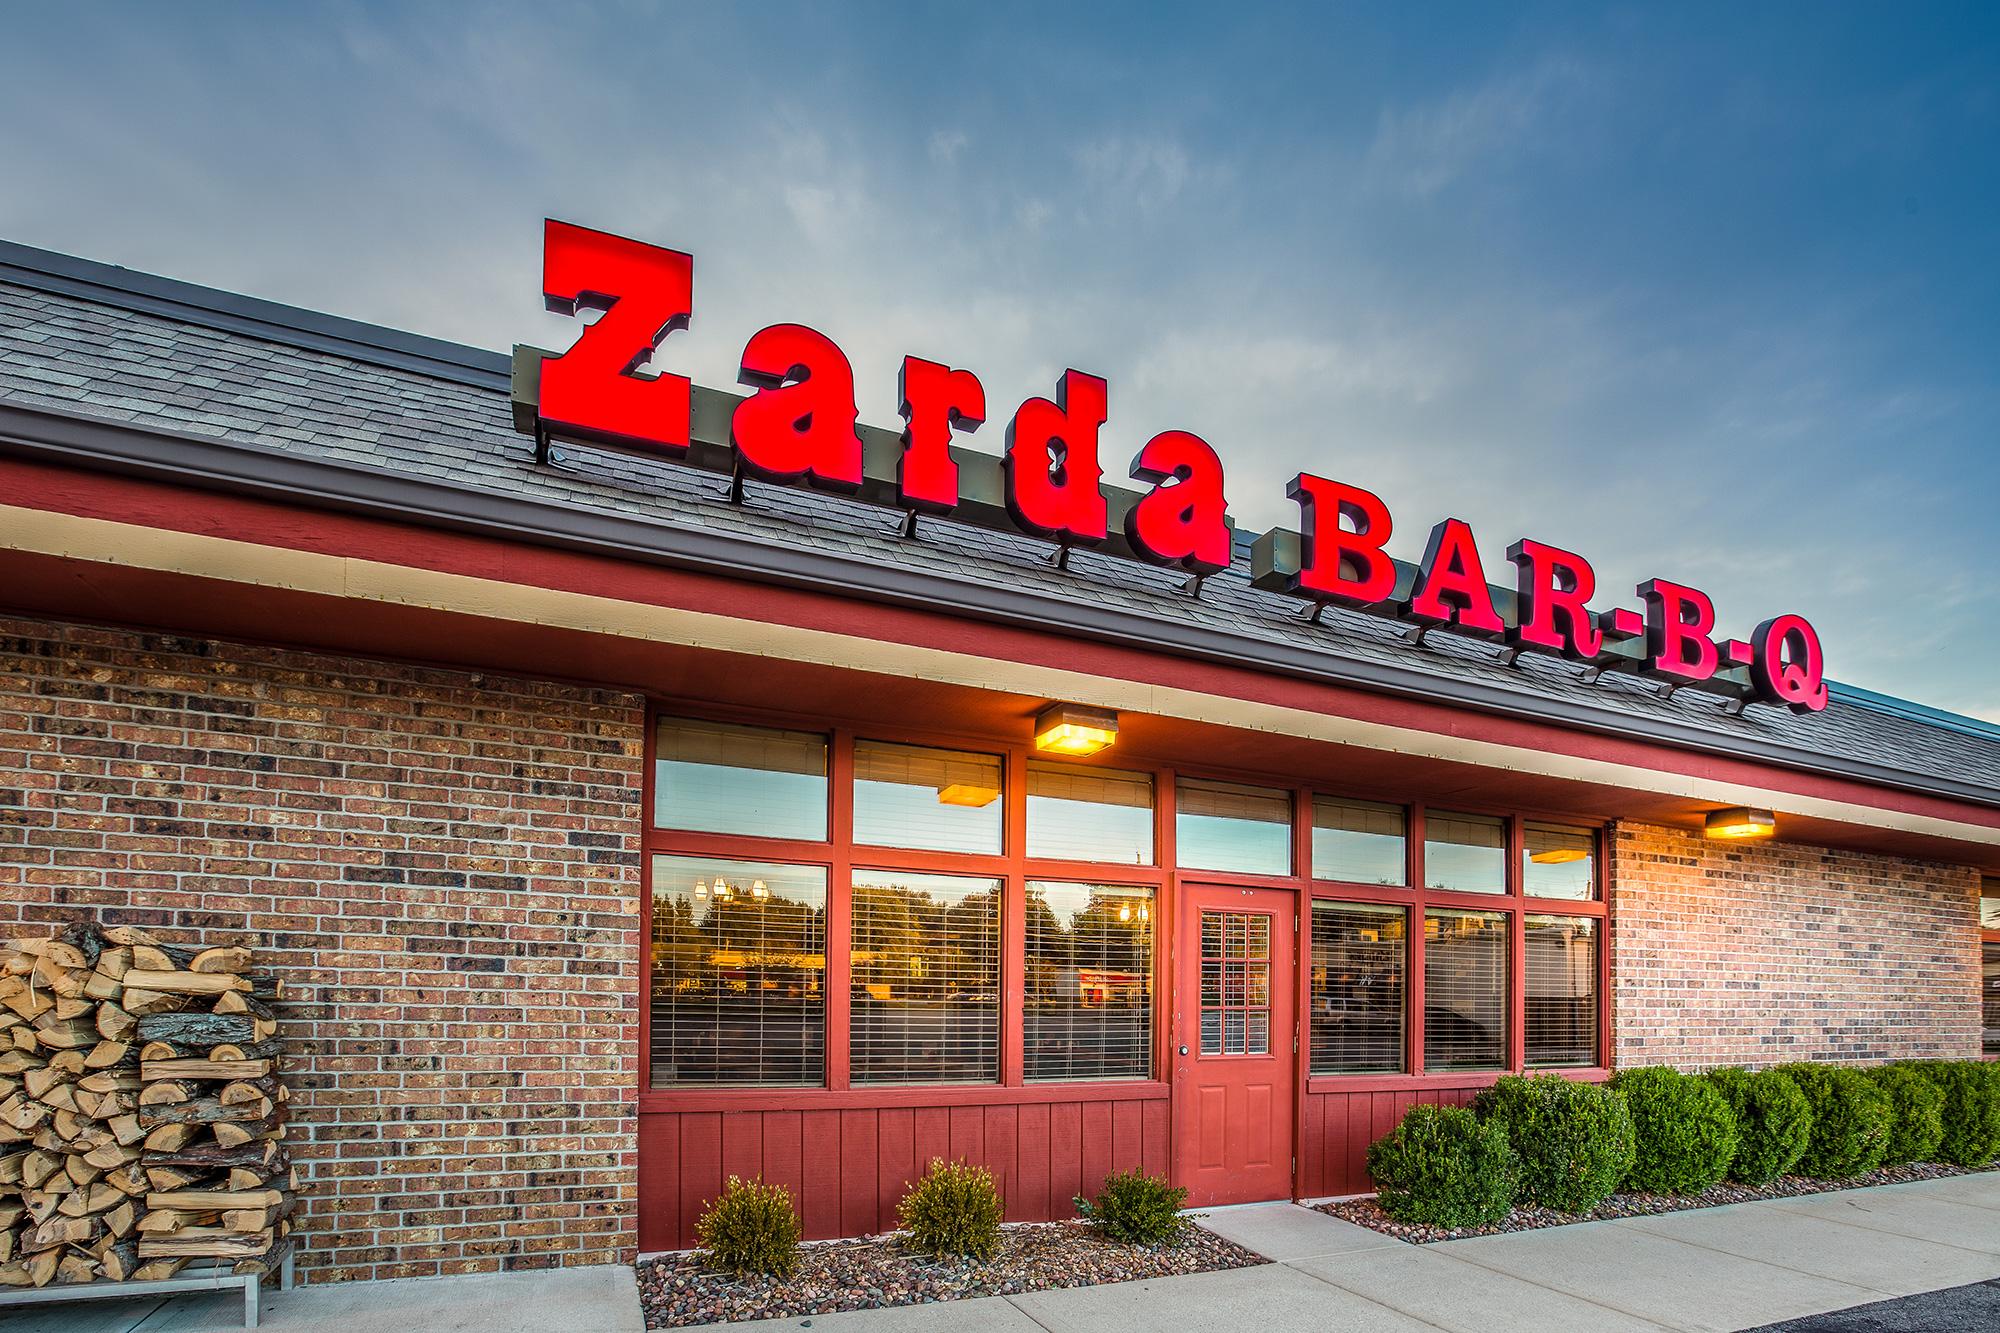 Zarda Dining Rooms Reopen June 22nd!